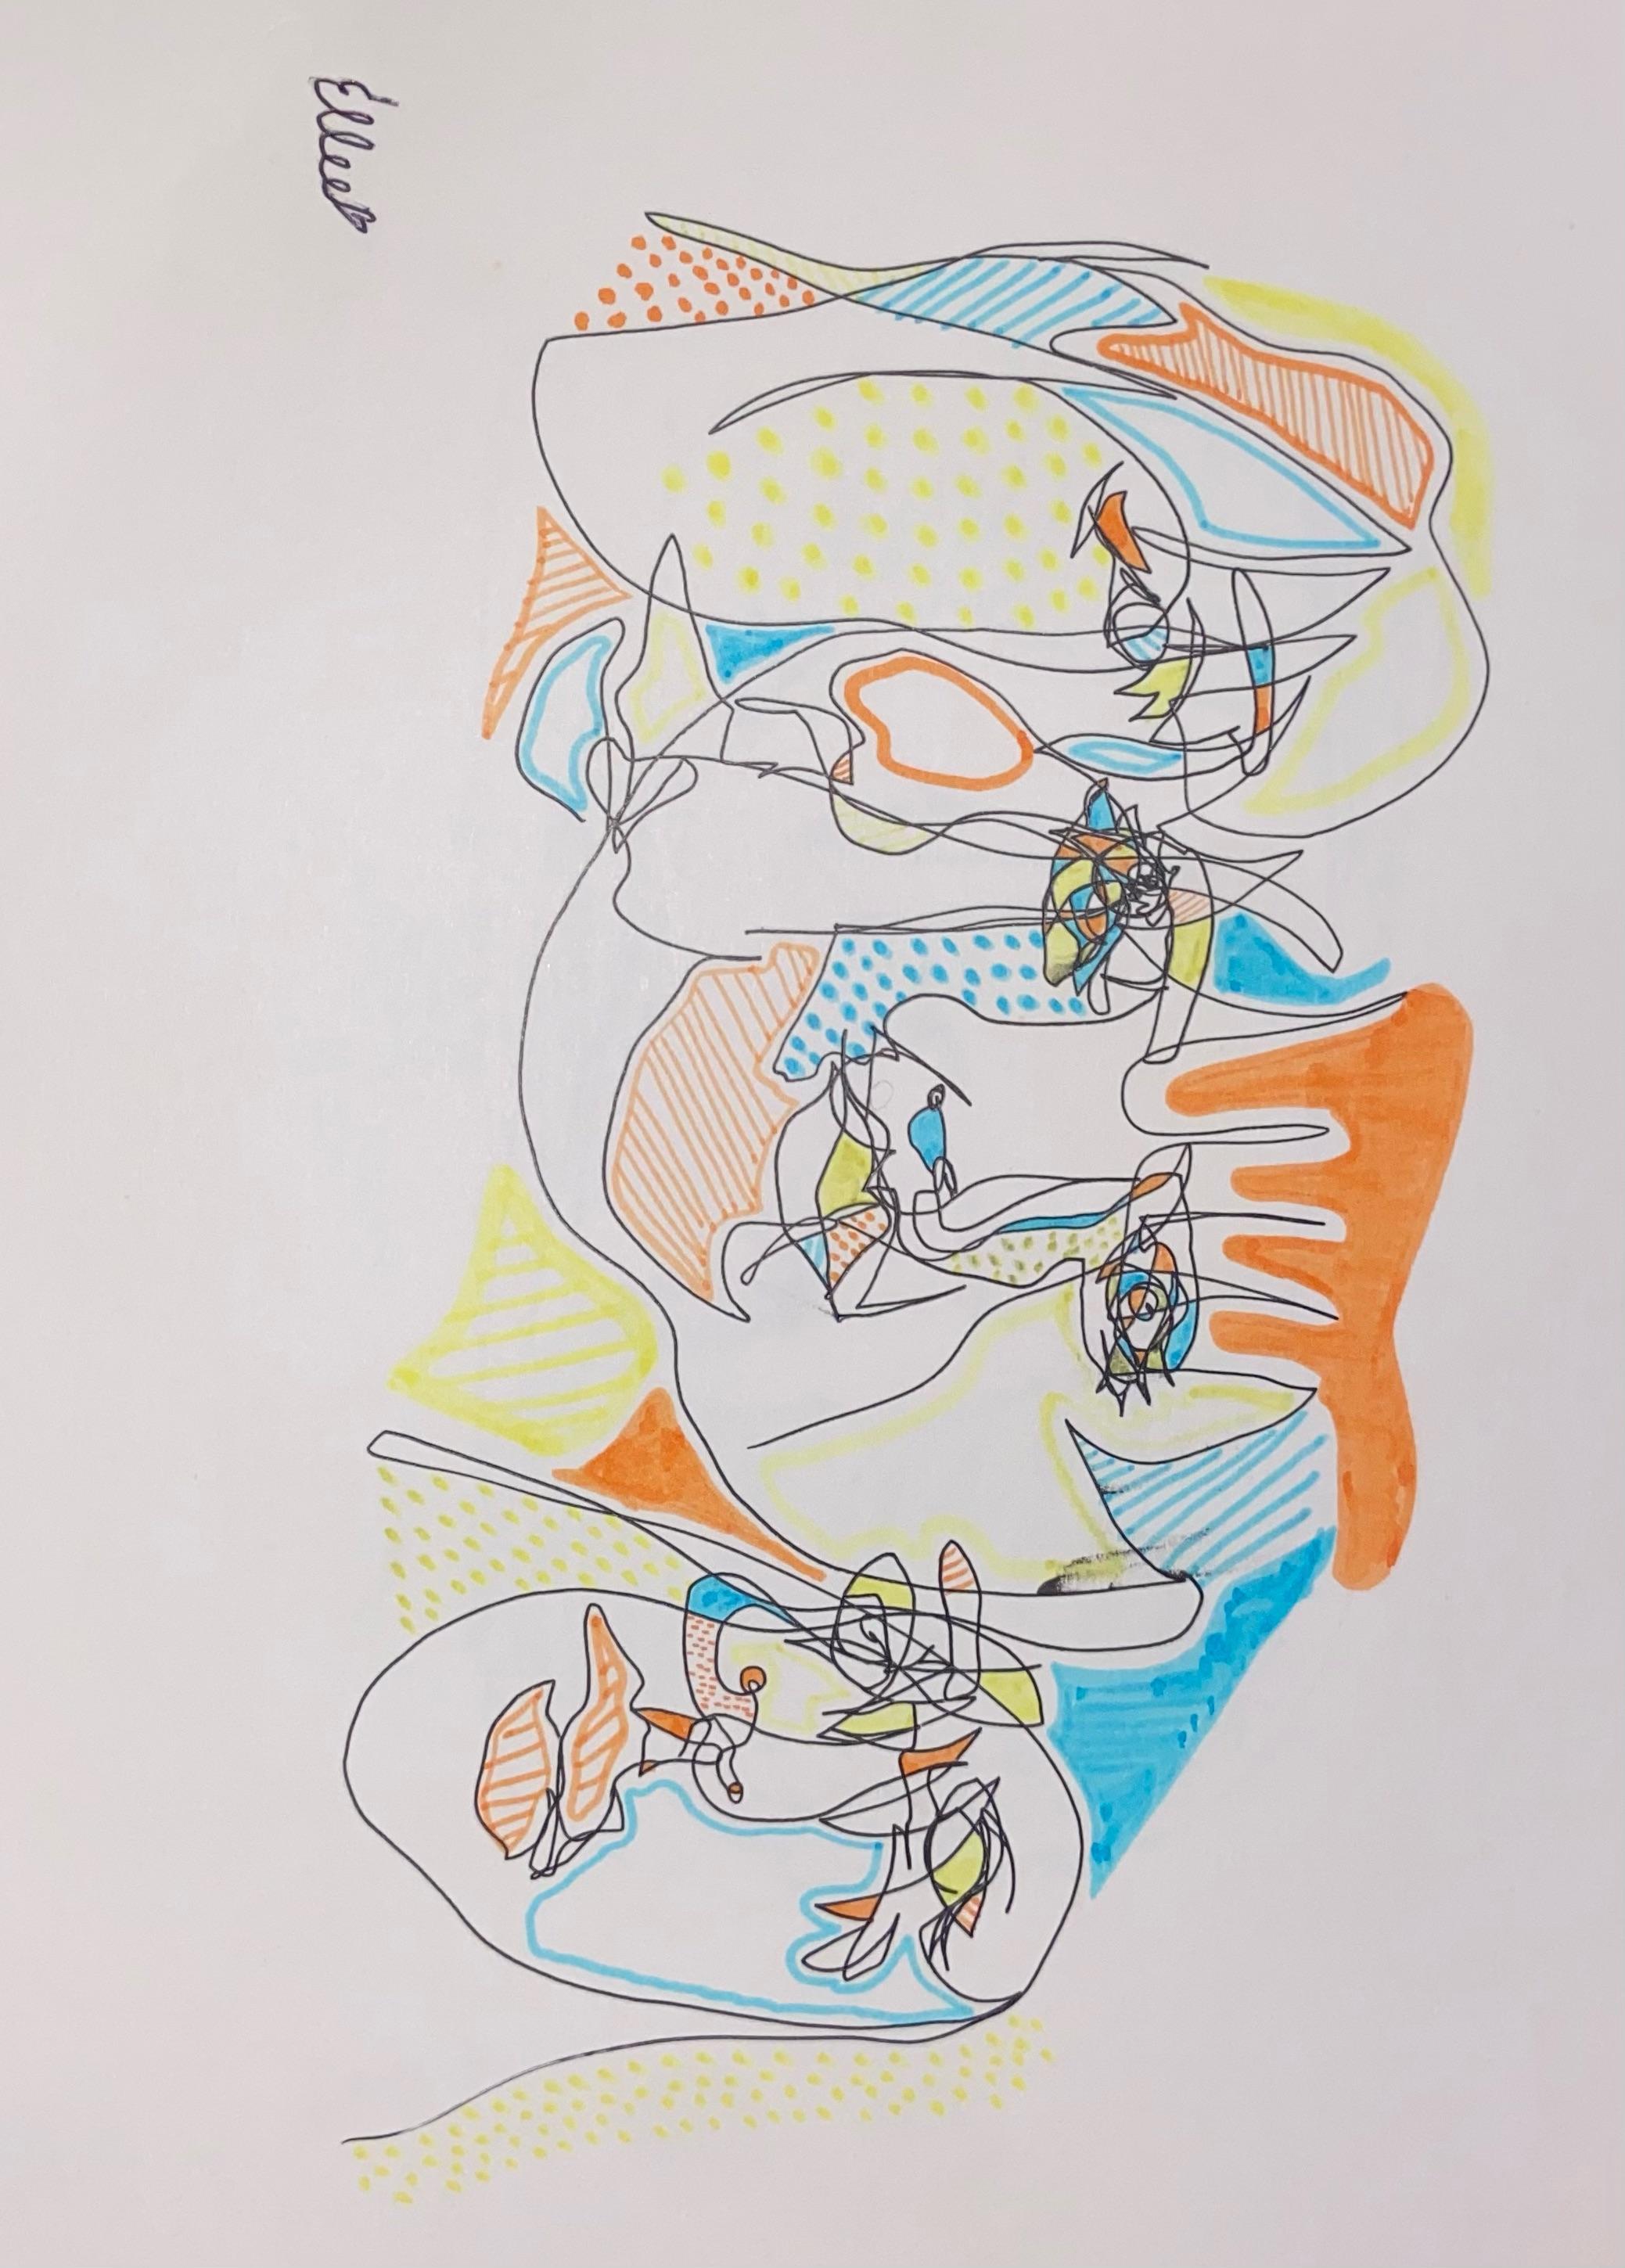 https://0201.nccdn.net/1_2/000/000/18e/f5f/elleemae-velasquez-art.jpeg